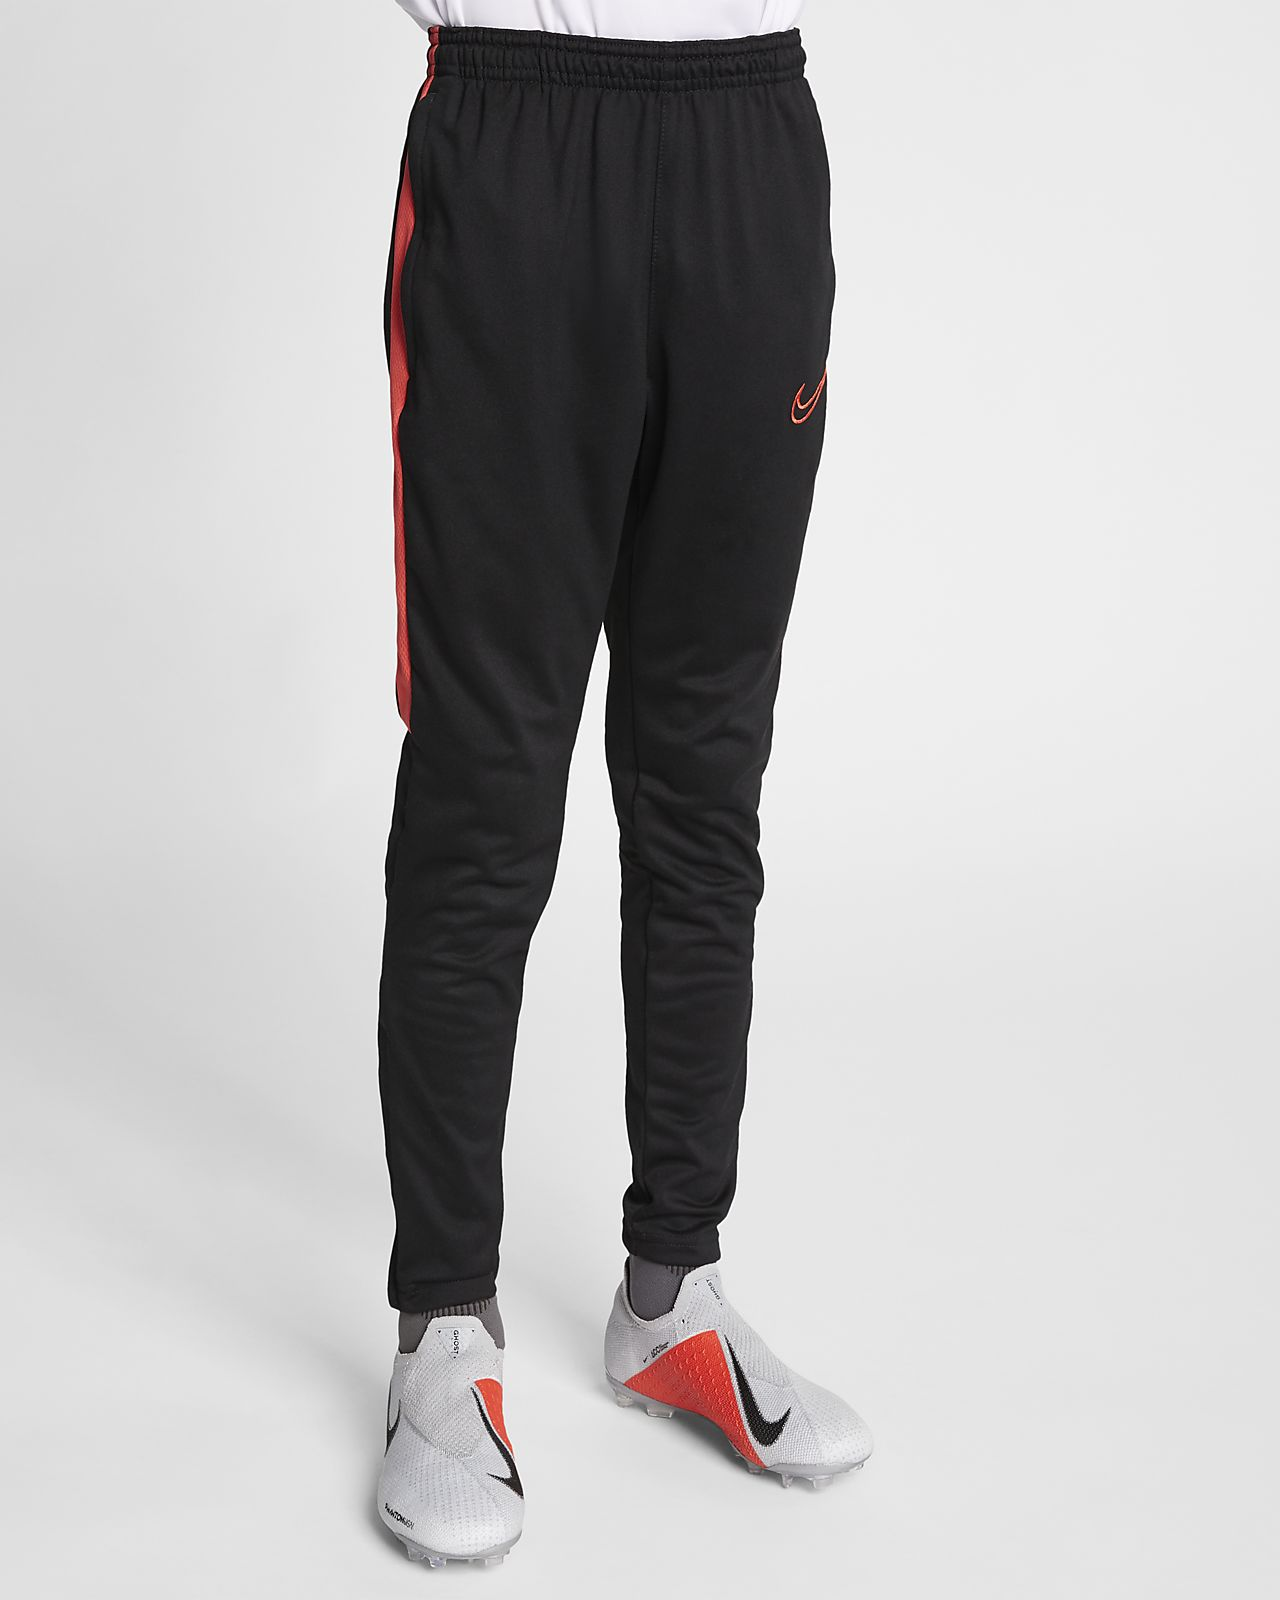 Pantalon de football Nike Dri-FIT Academy pour Enfant plus âgé. Nike ... 961891bb826b0